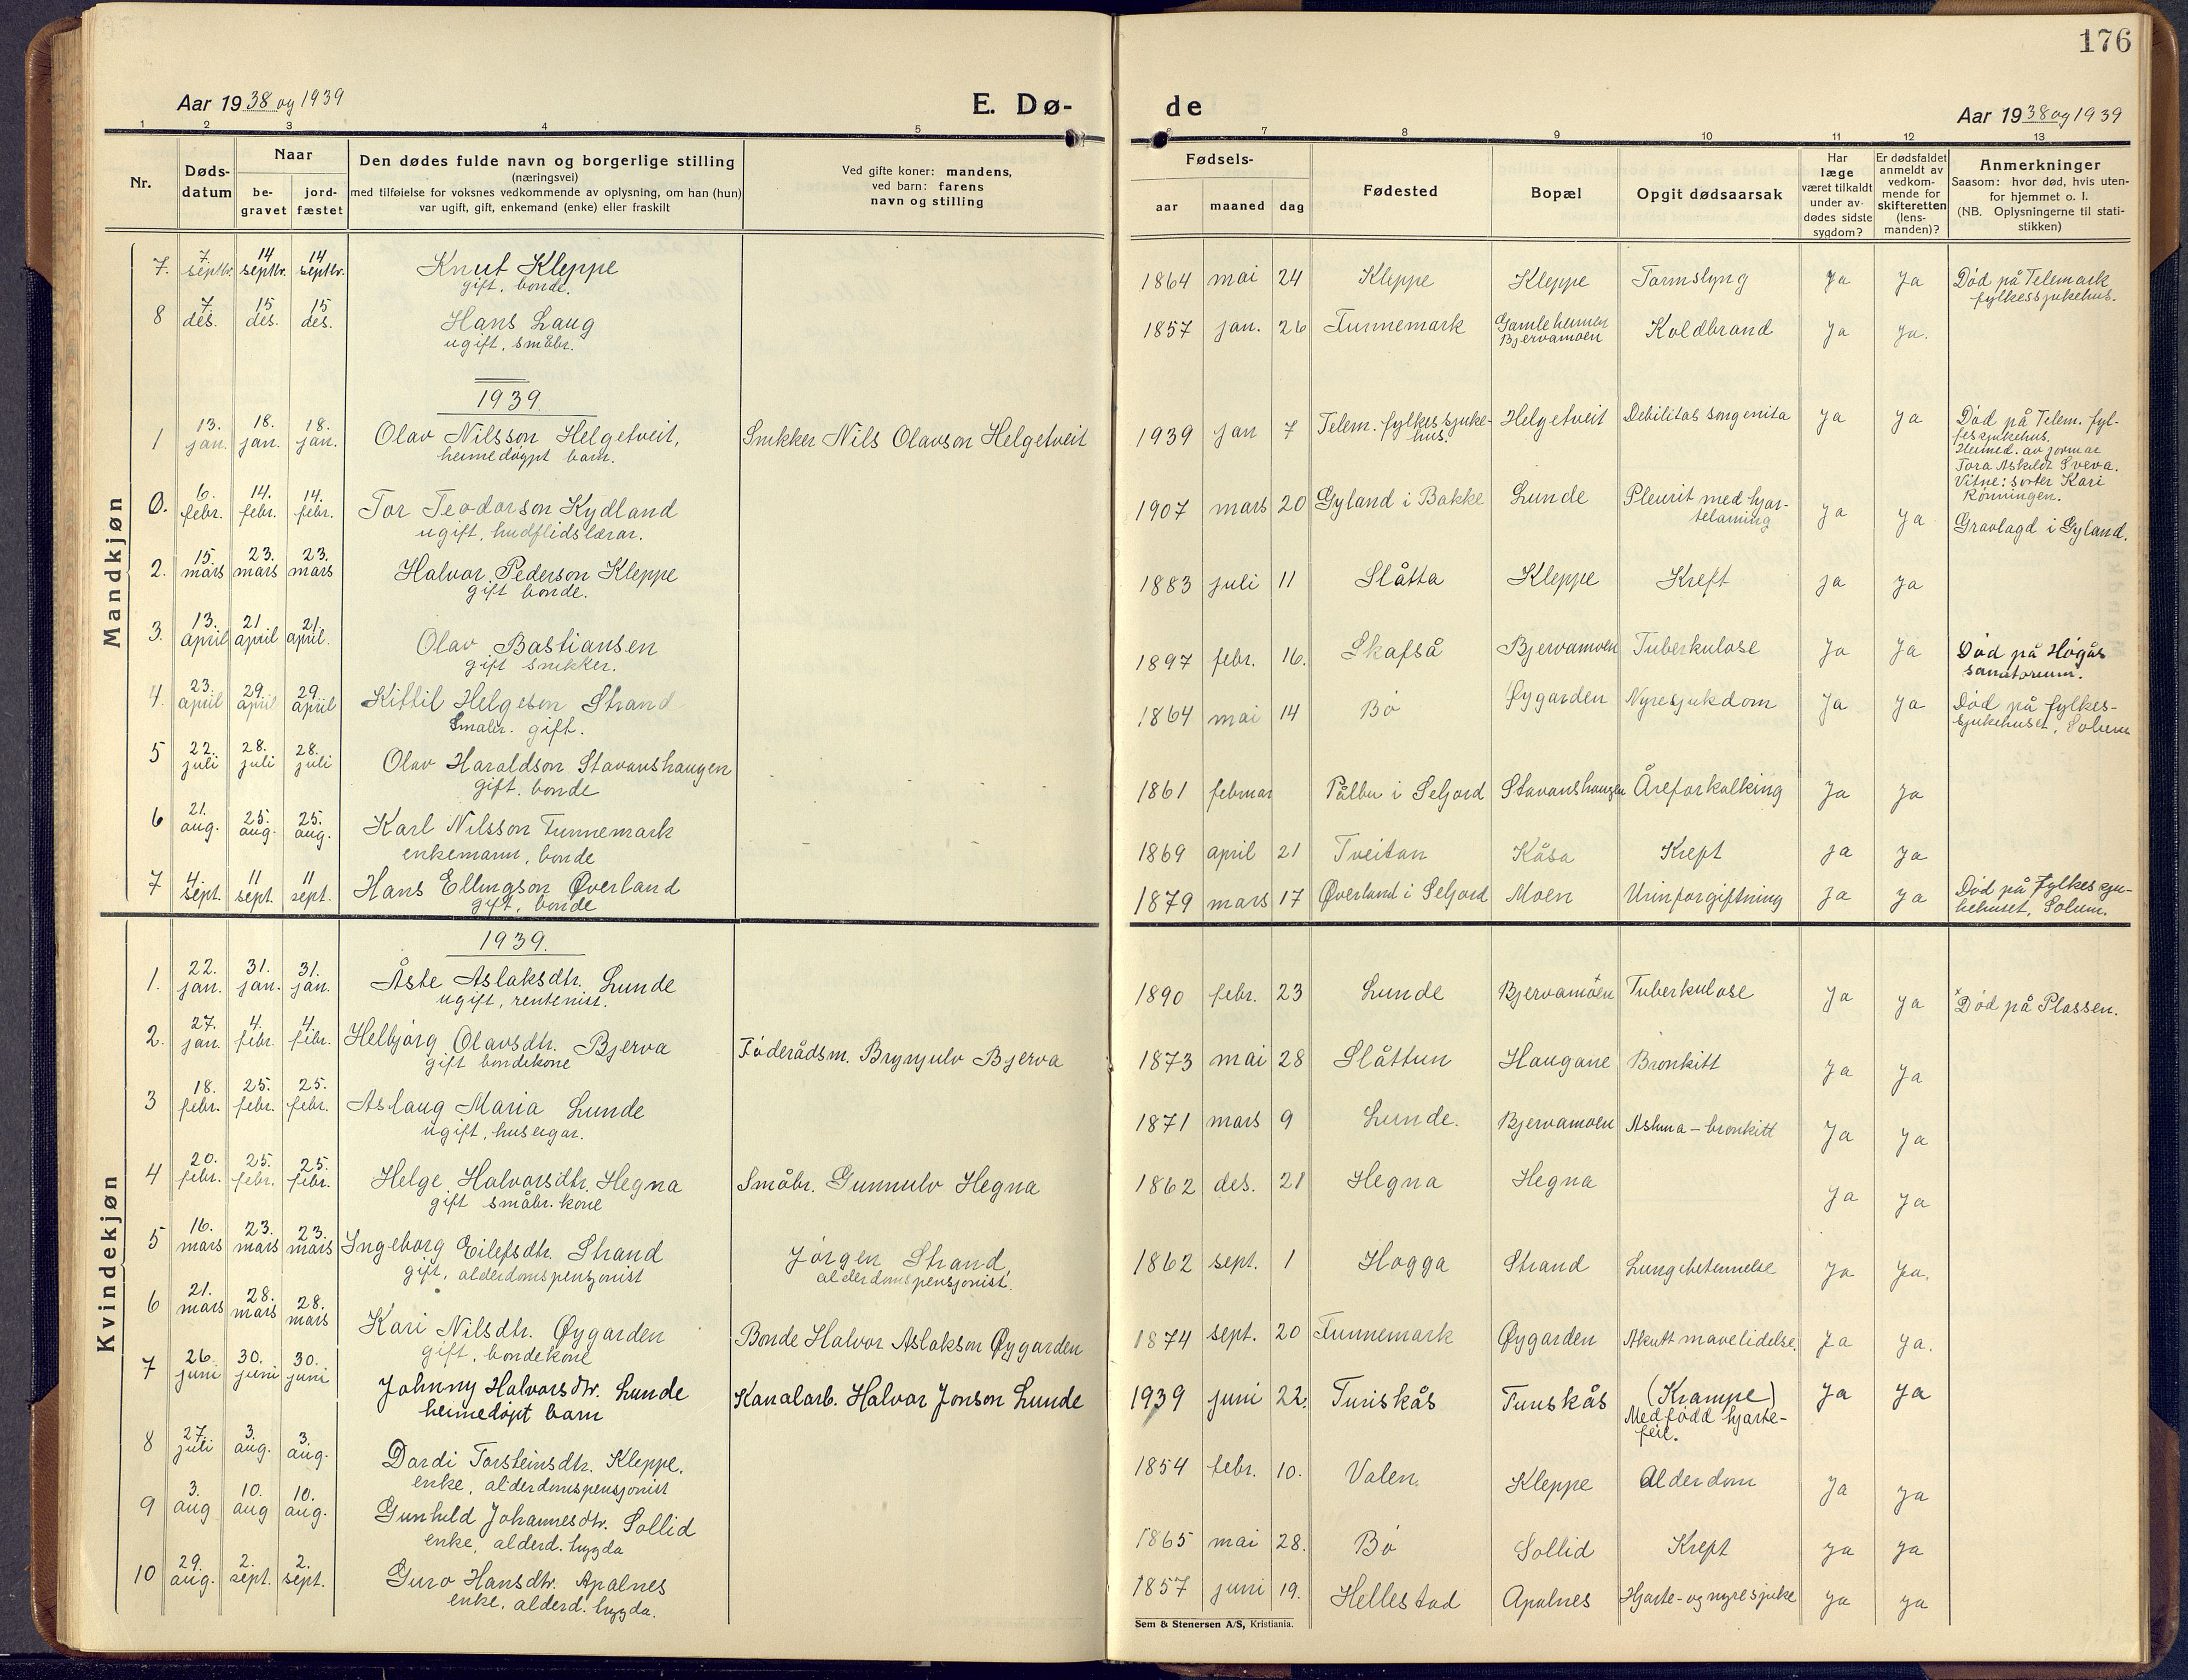 SAKO, Lunde kirkebøker, F/Fa/L0006: Ministerialbok nr. I 6, 1922-1940, s. 176